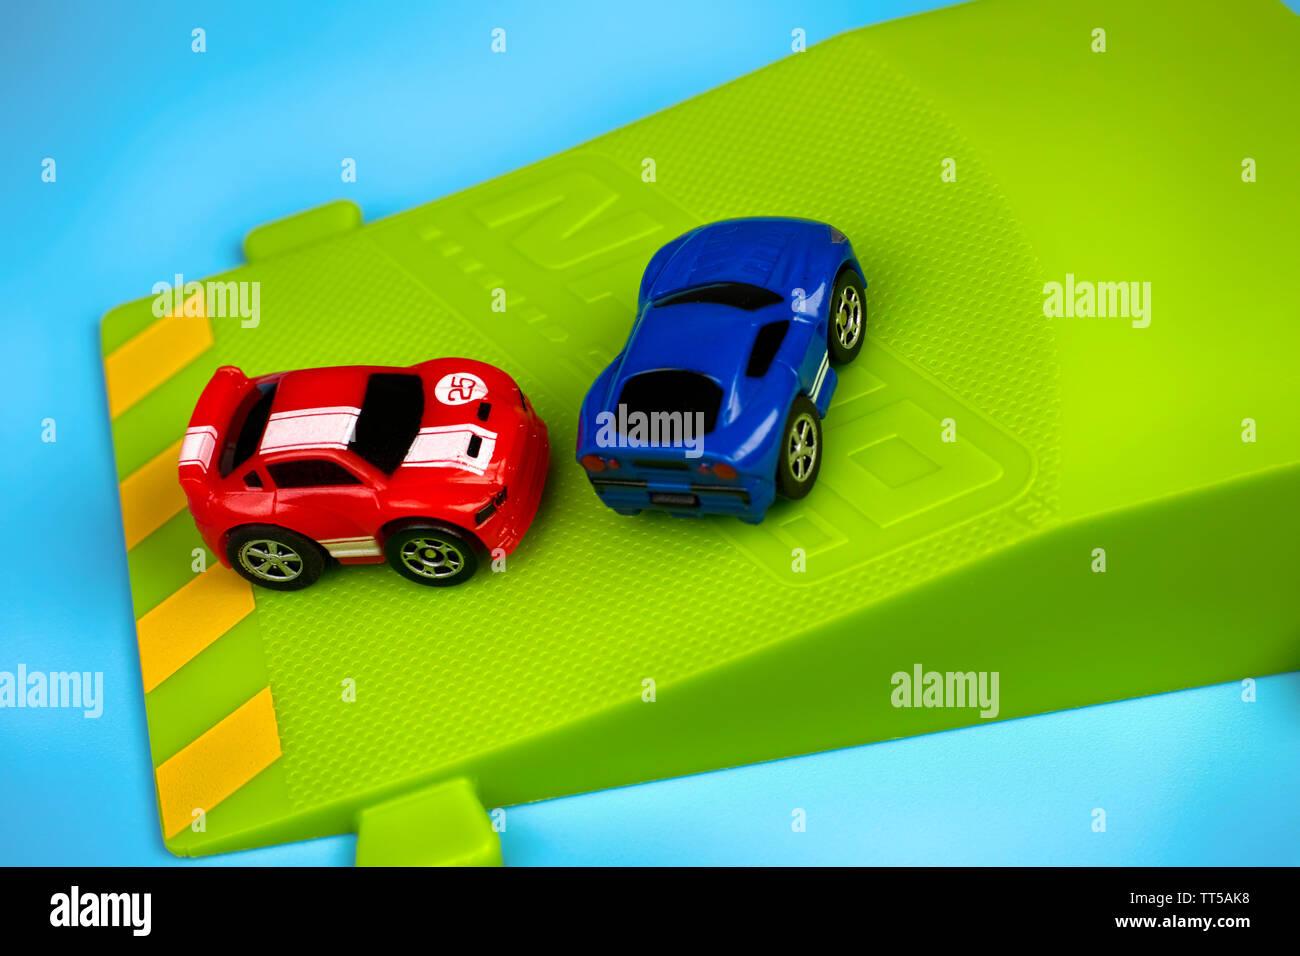 Tambov, Russian Federation - January 25, 2015 Two Nano Speed Micro Cars on green springboard on blue background. Studio shot. - Stock Image